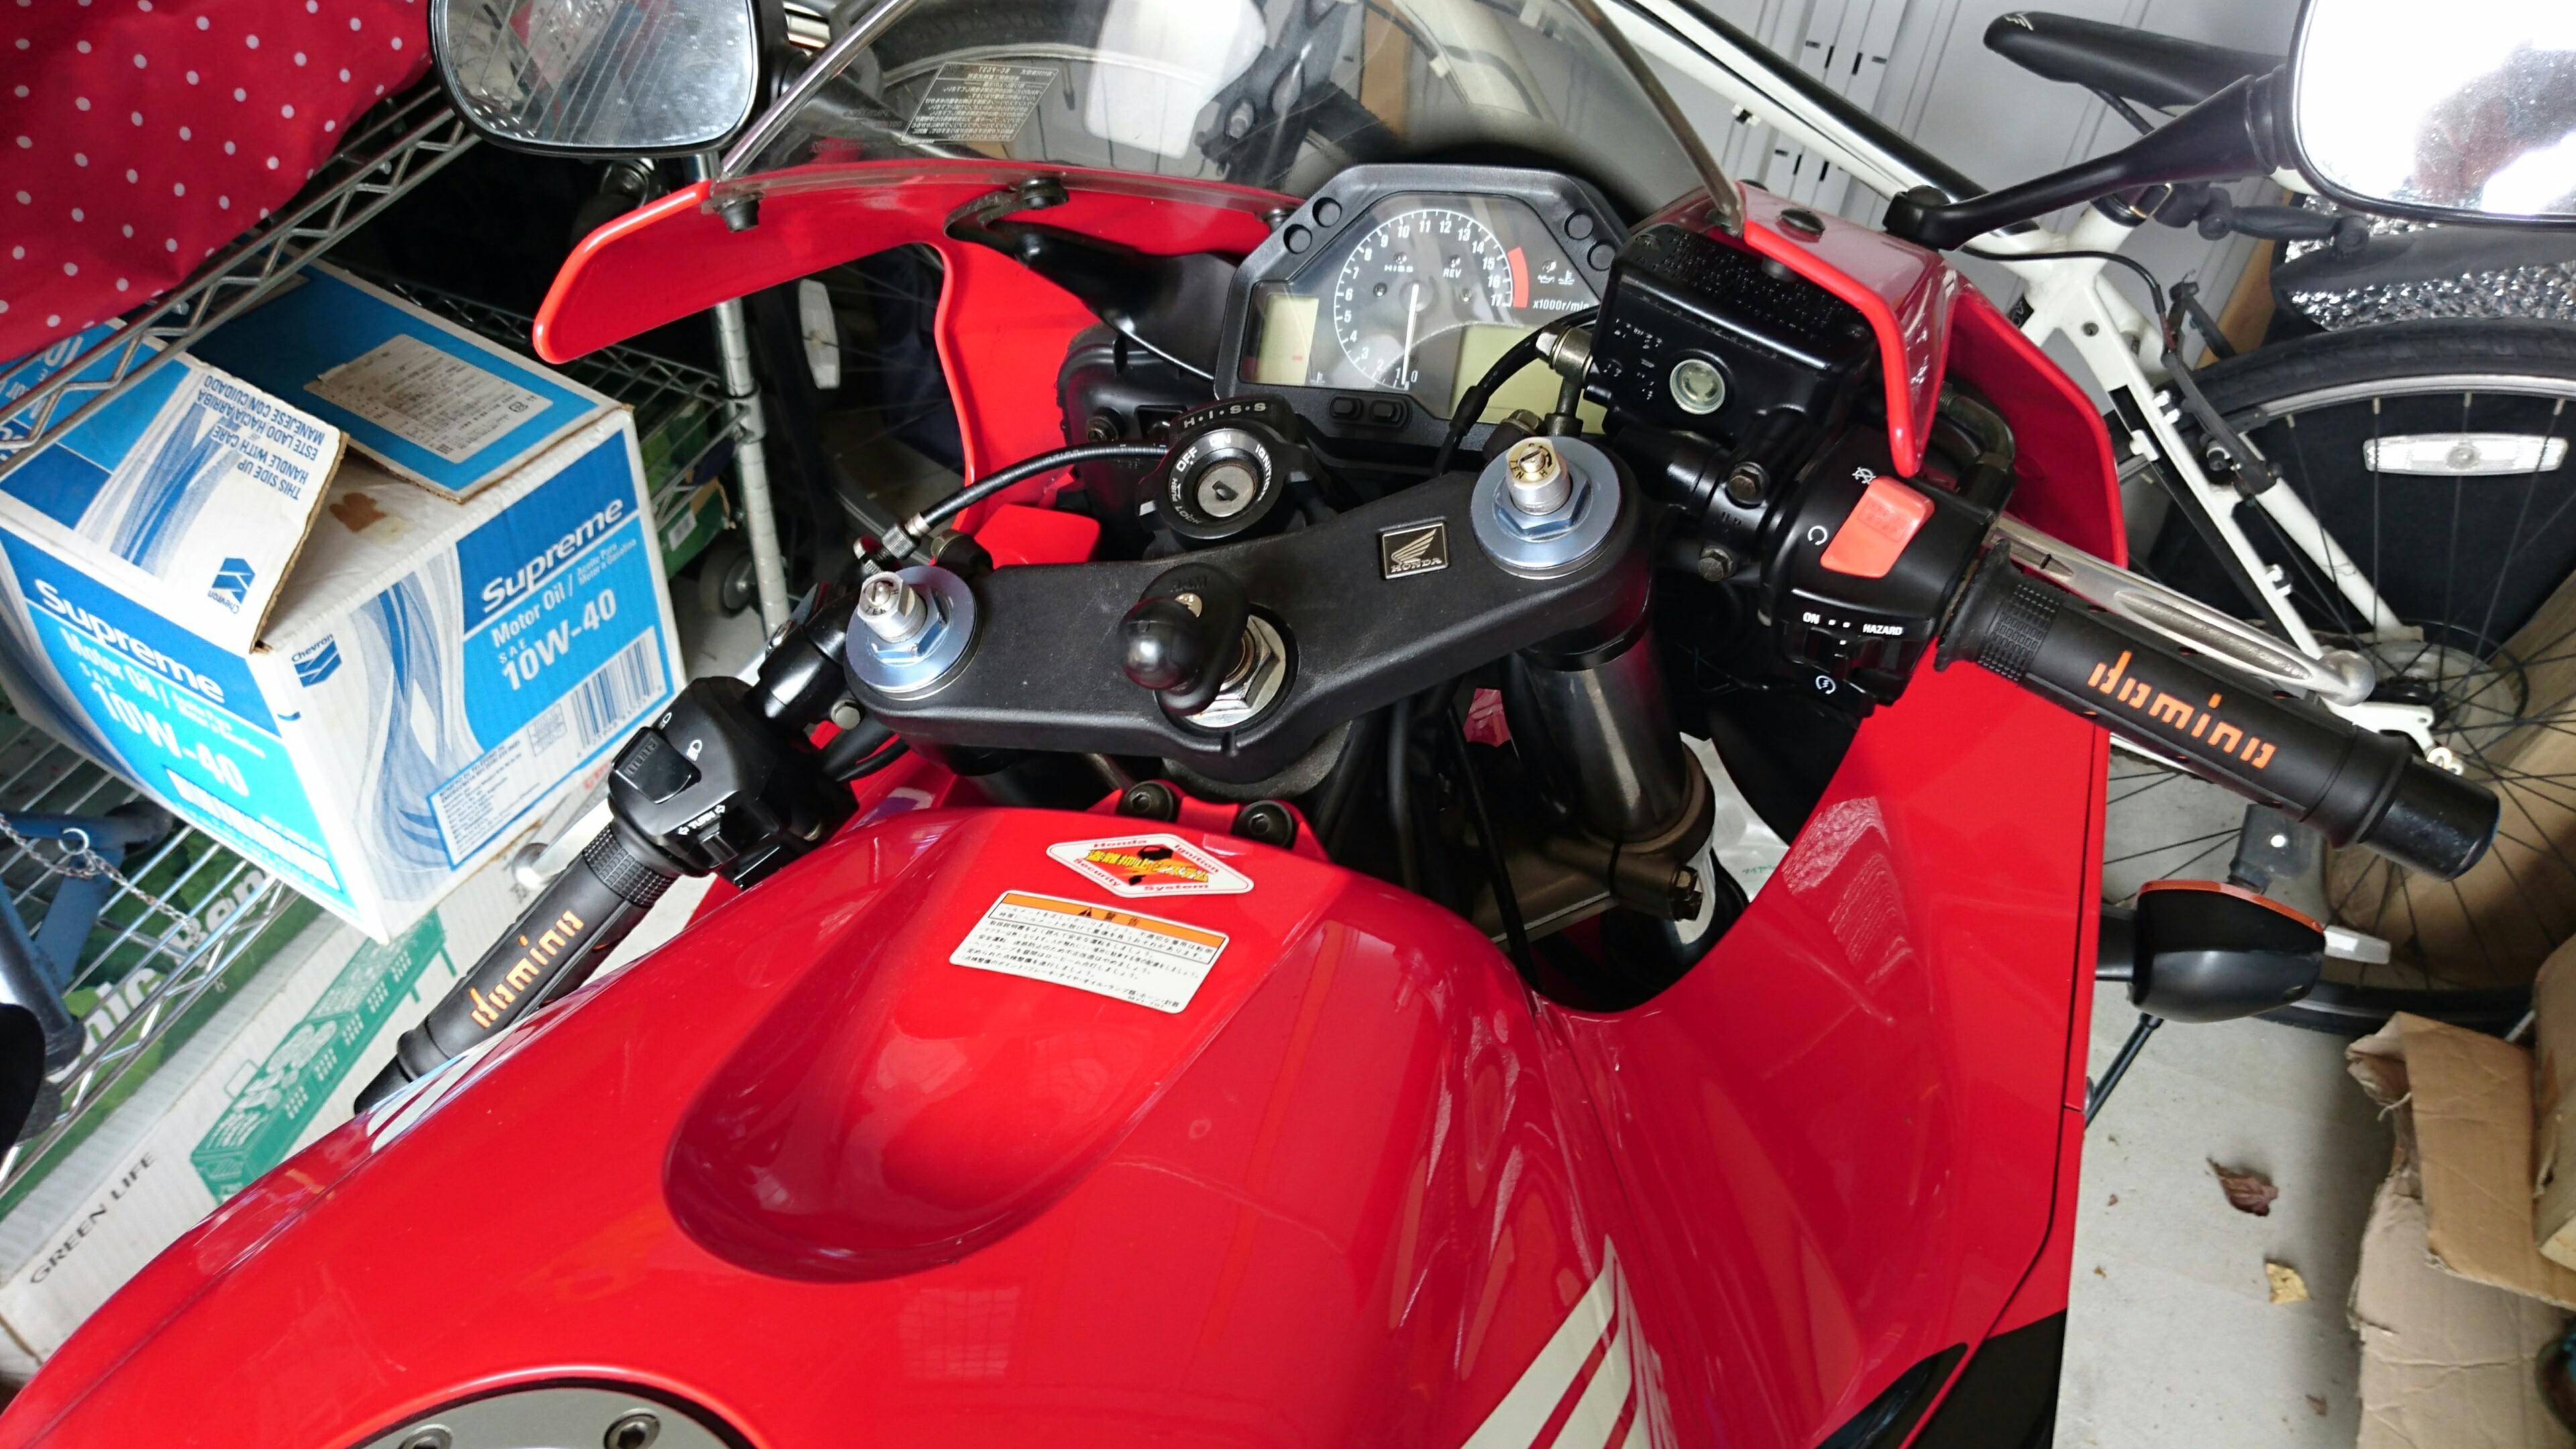 f:id:bikemanzou:20170326144034j:image